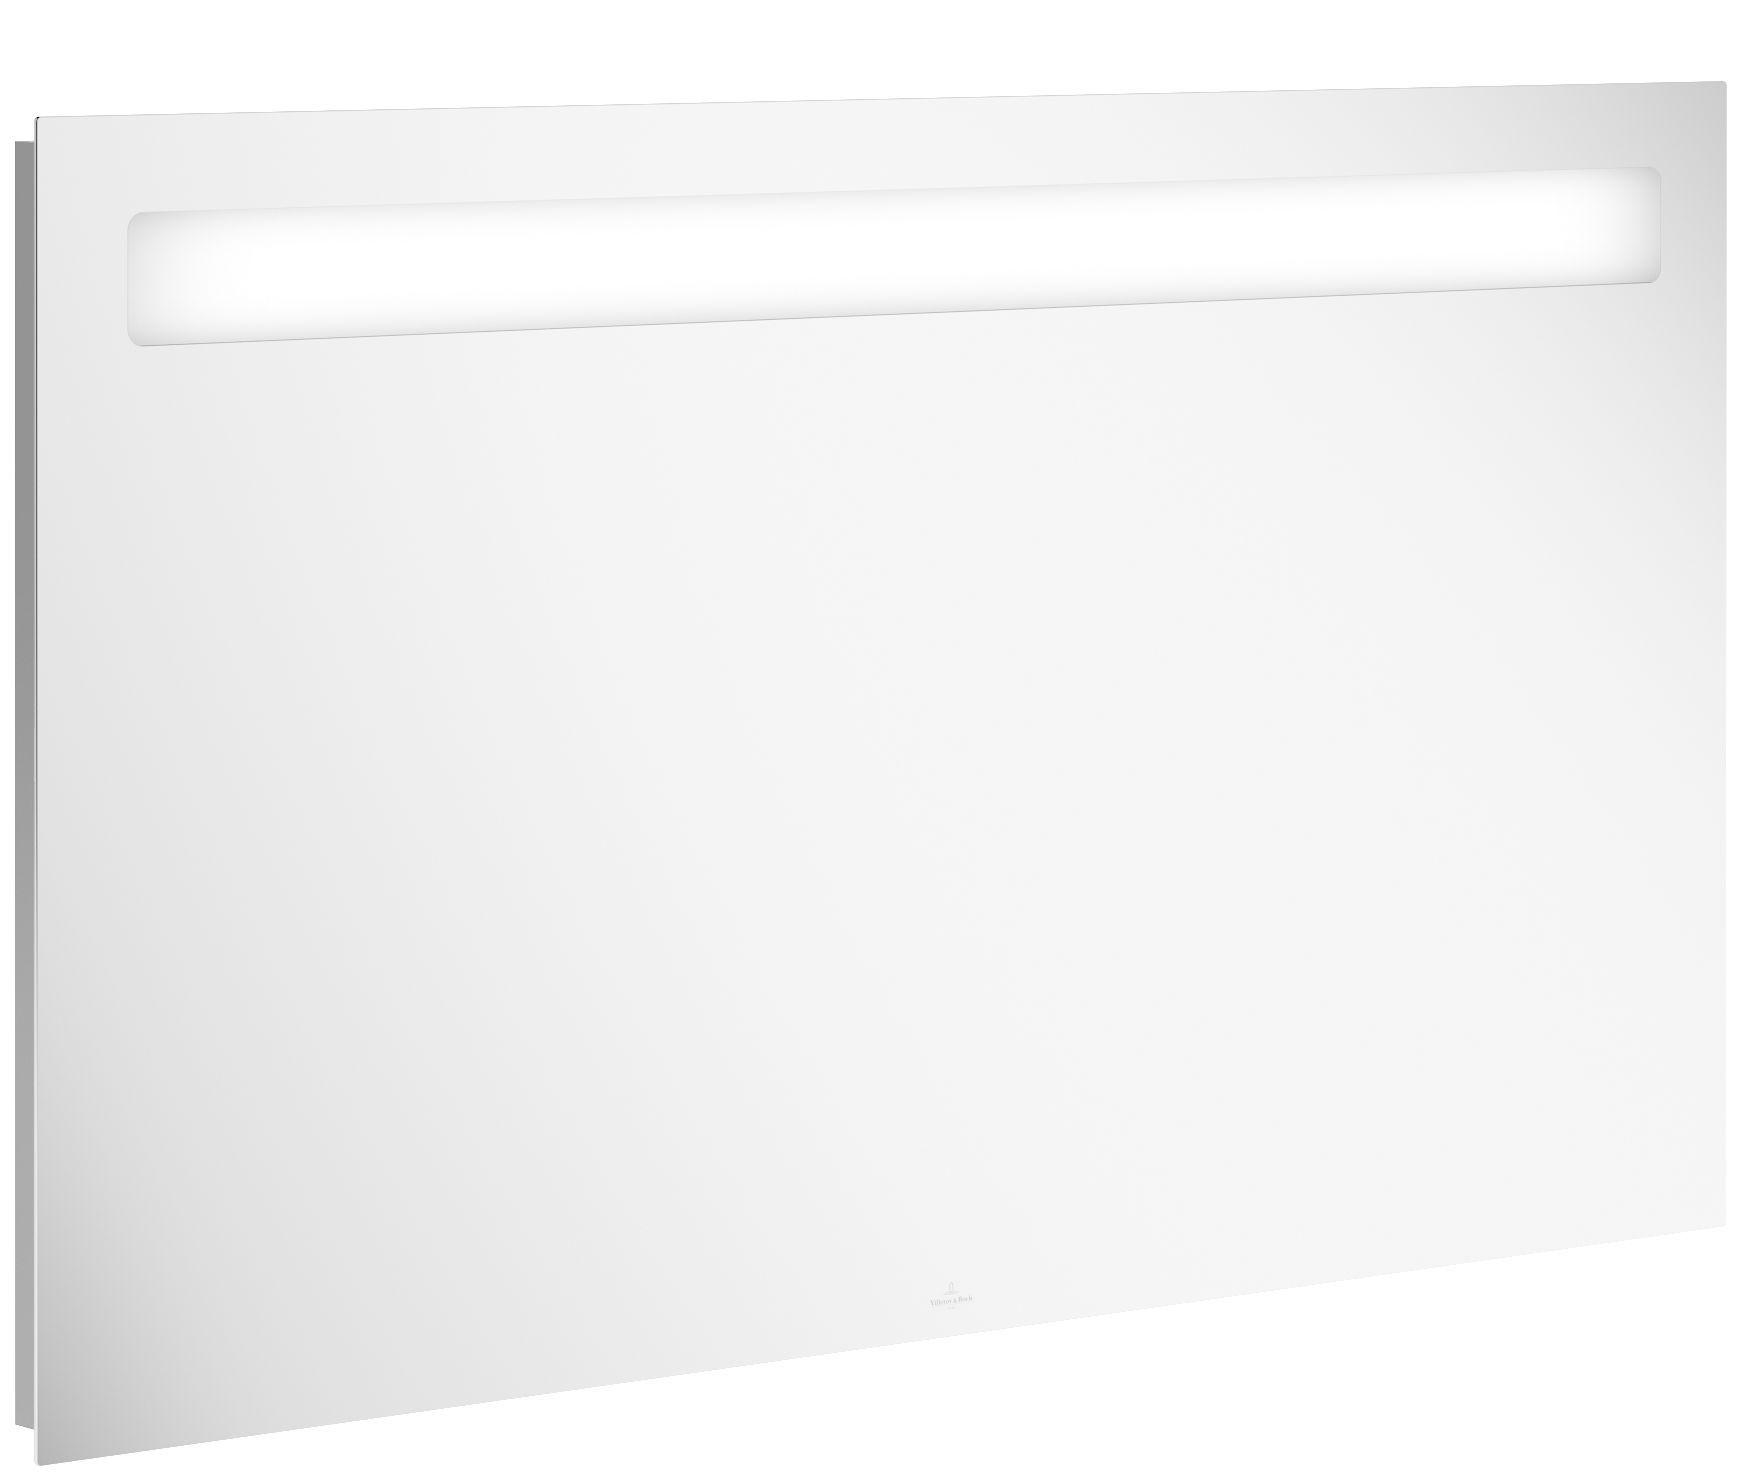 Villeroy & Boch More to See 14 Spiegel mit Beleuchtung B:130xH:75xT:4,7cm A4321300